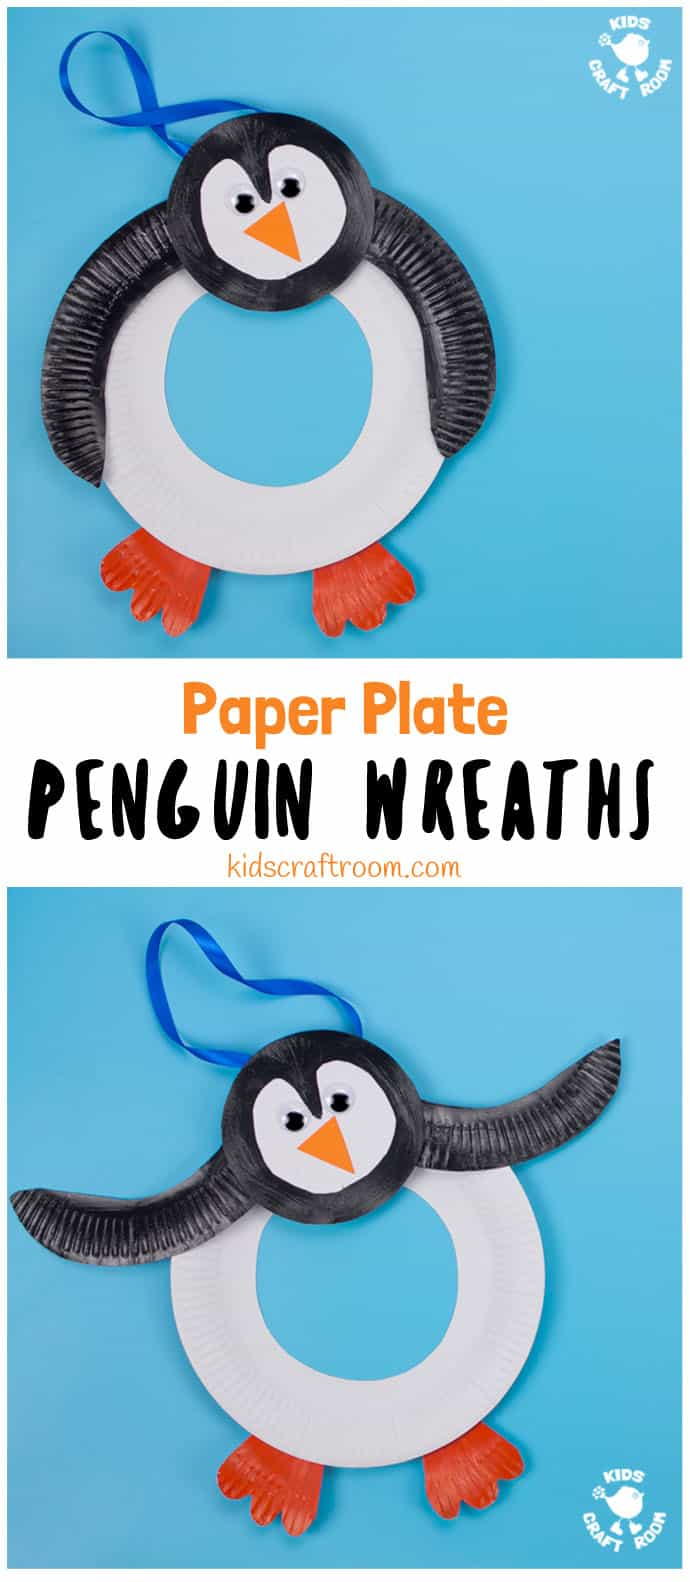 Paper Plate Penguin Wreath #penguincraft